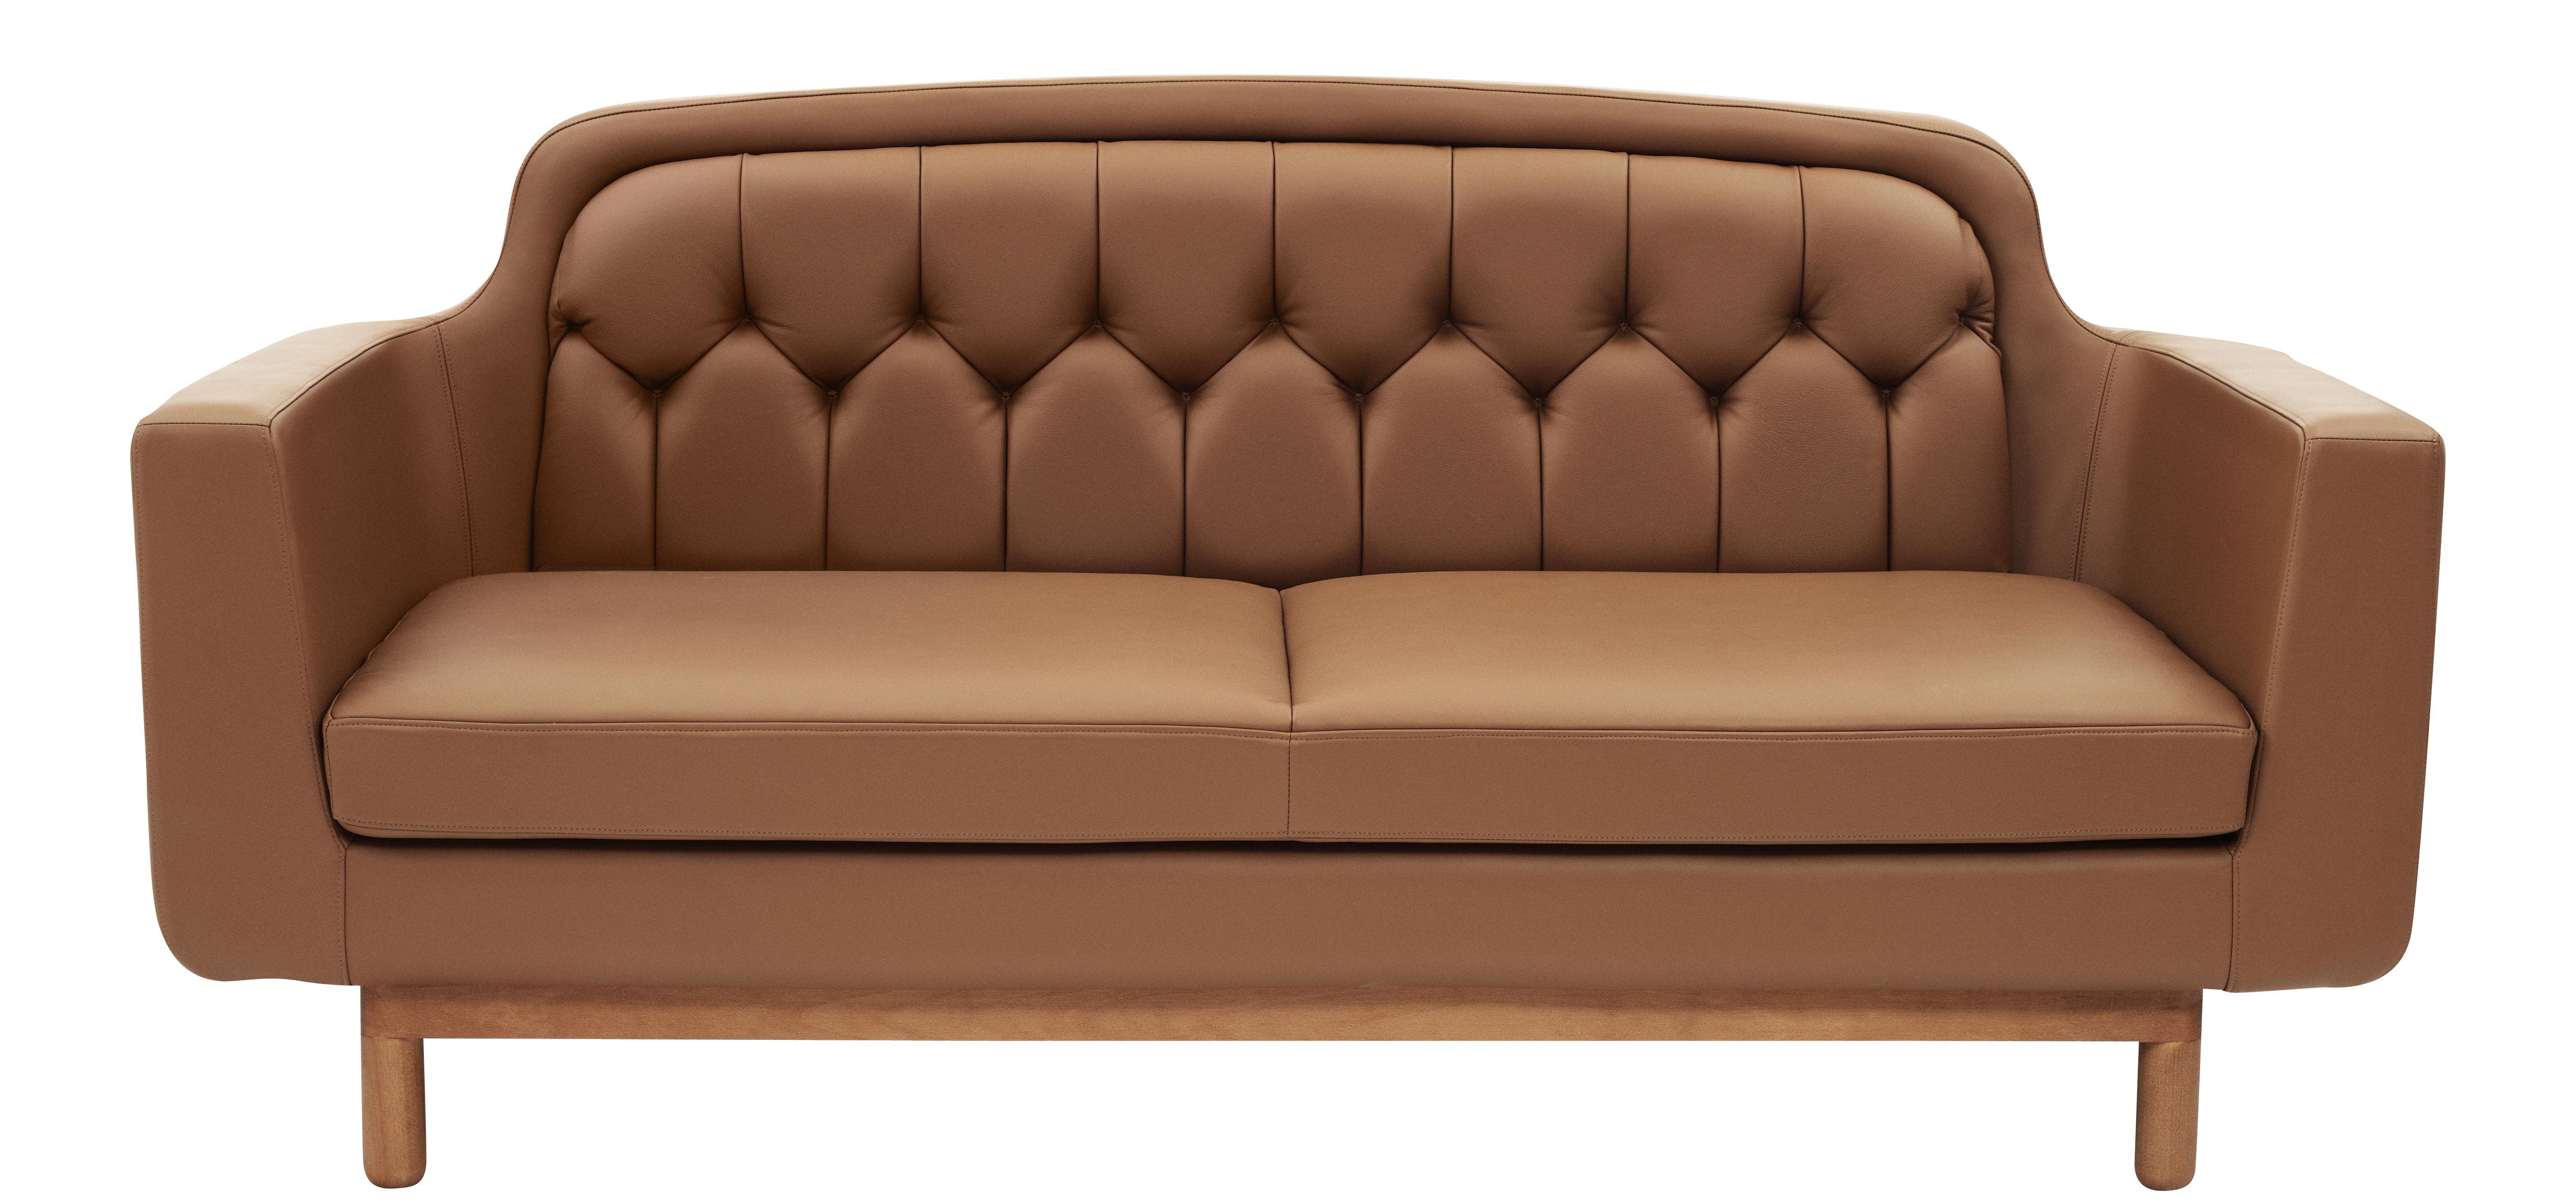 Möbel - Sofas - Onkel Sofa Cuir / 2 places - L 185 cm - Normann Copenhagen - Cognacfarben - Holz, Leder, Schaumstoff